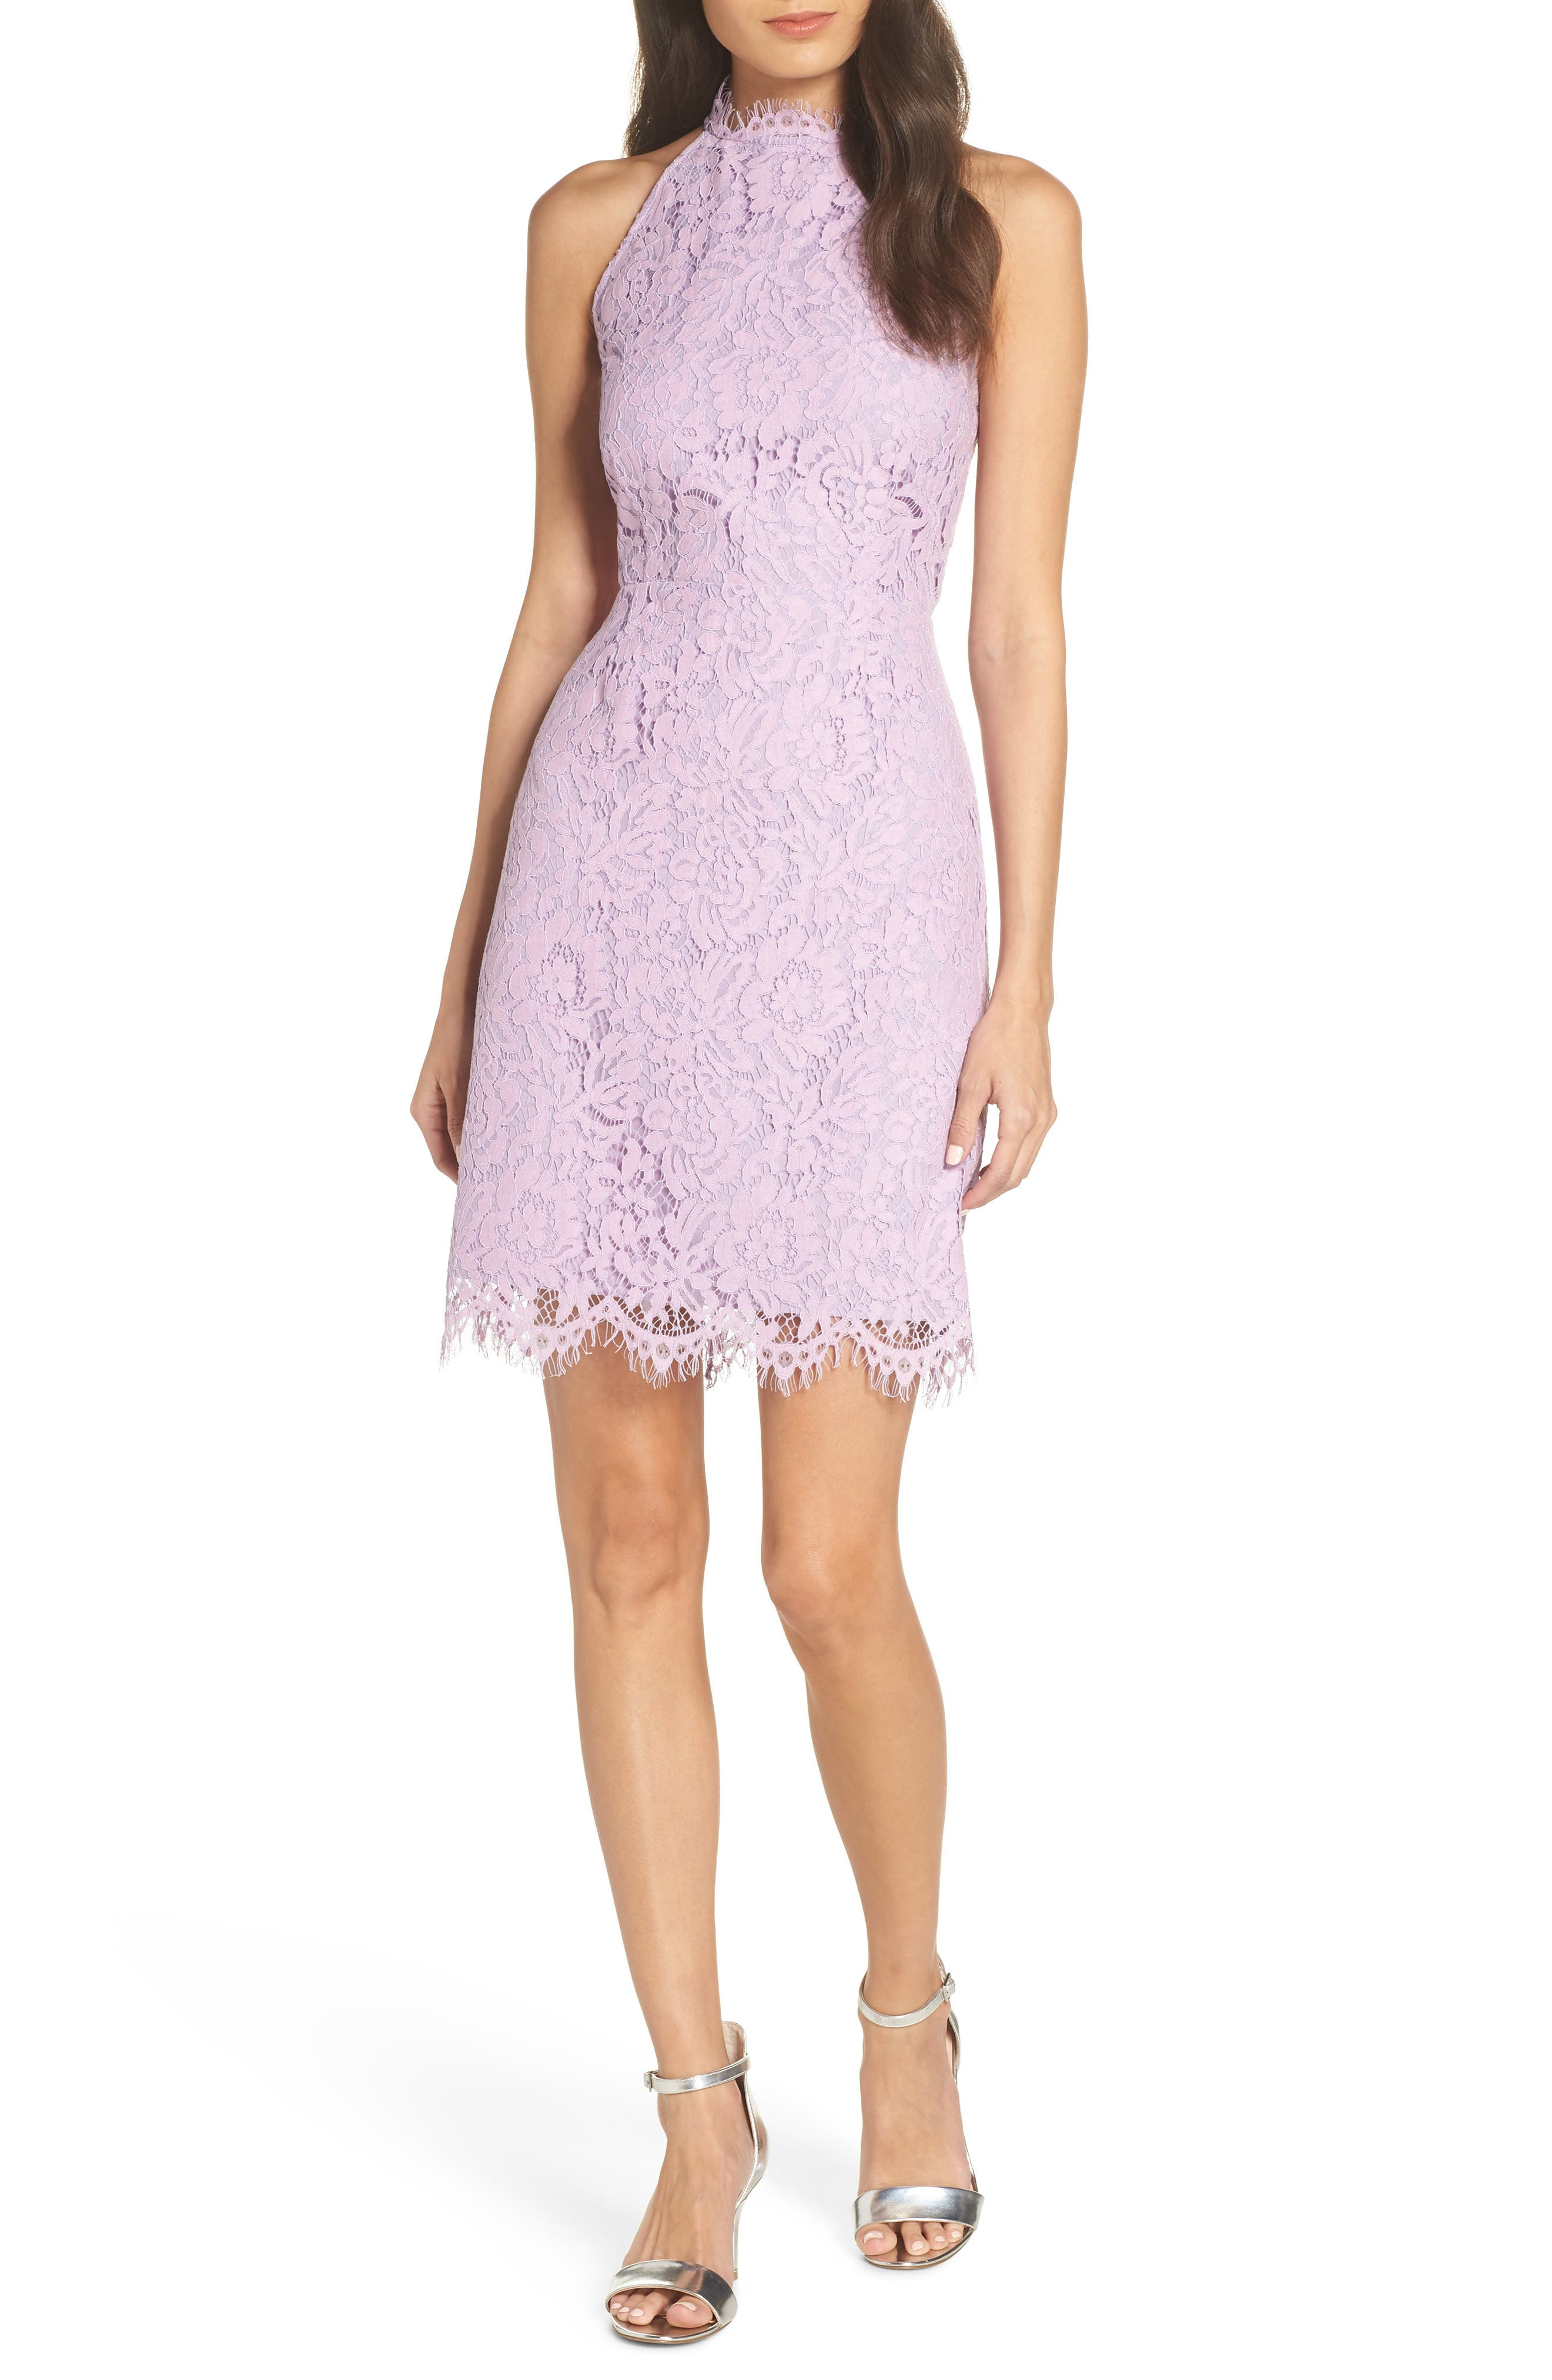 Bb Dakota Cara High Neck Lace Cocktail Dress, Purple